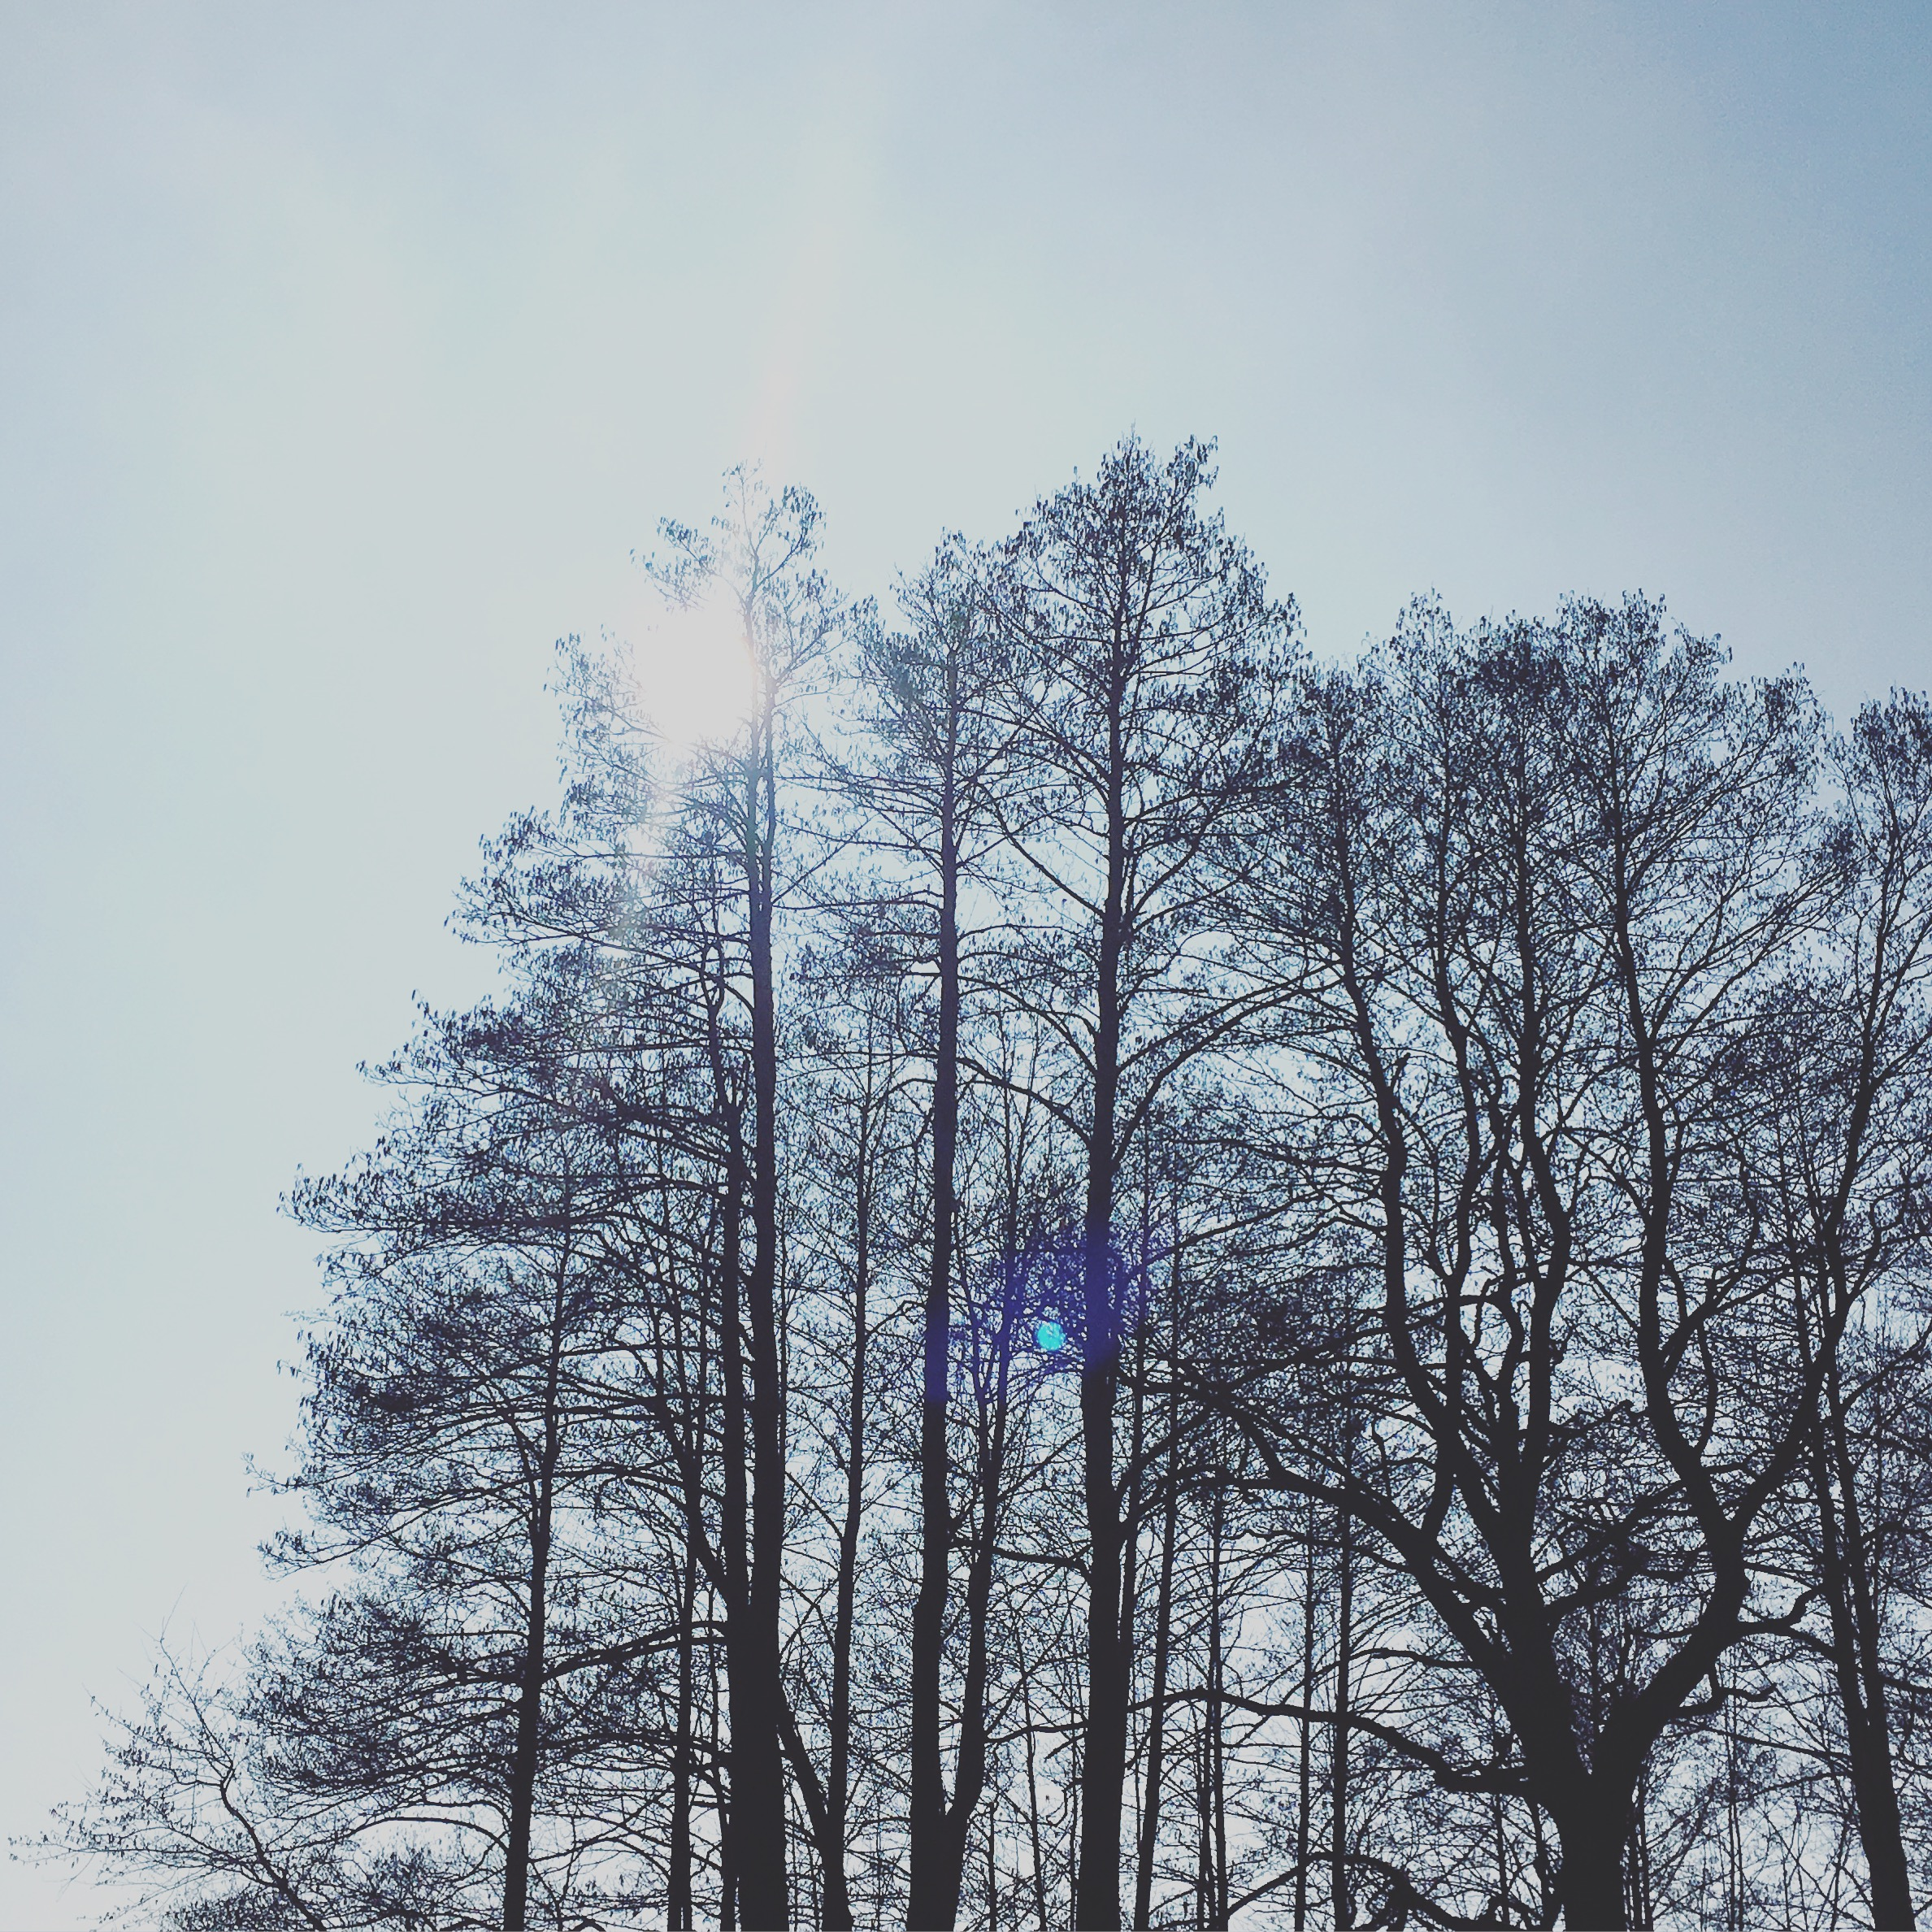 maybeyoulike_sun_trees